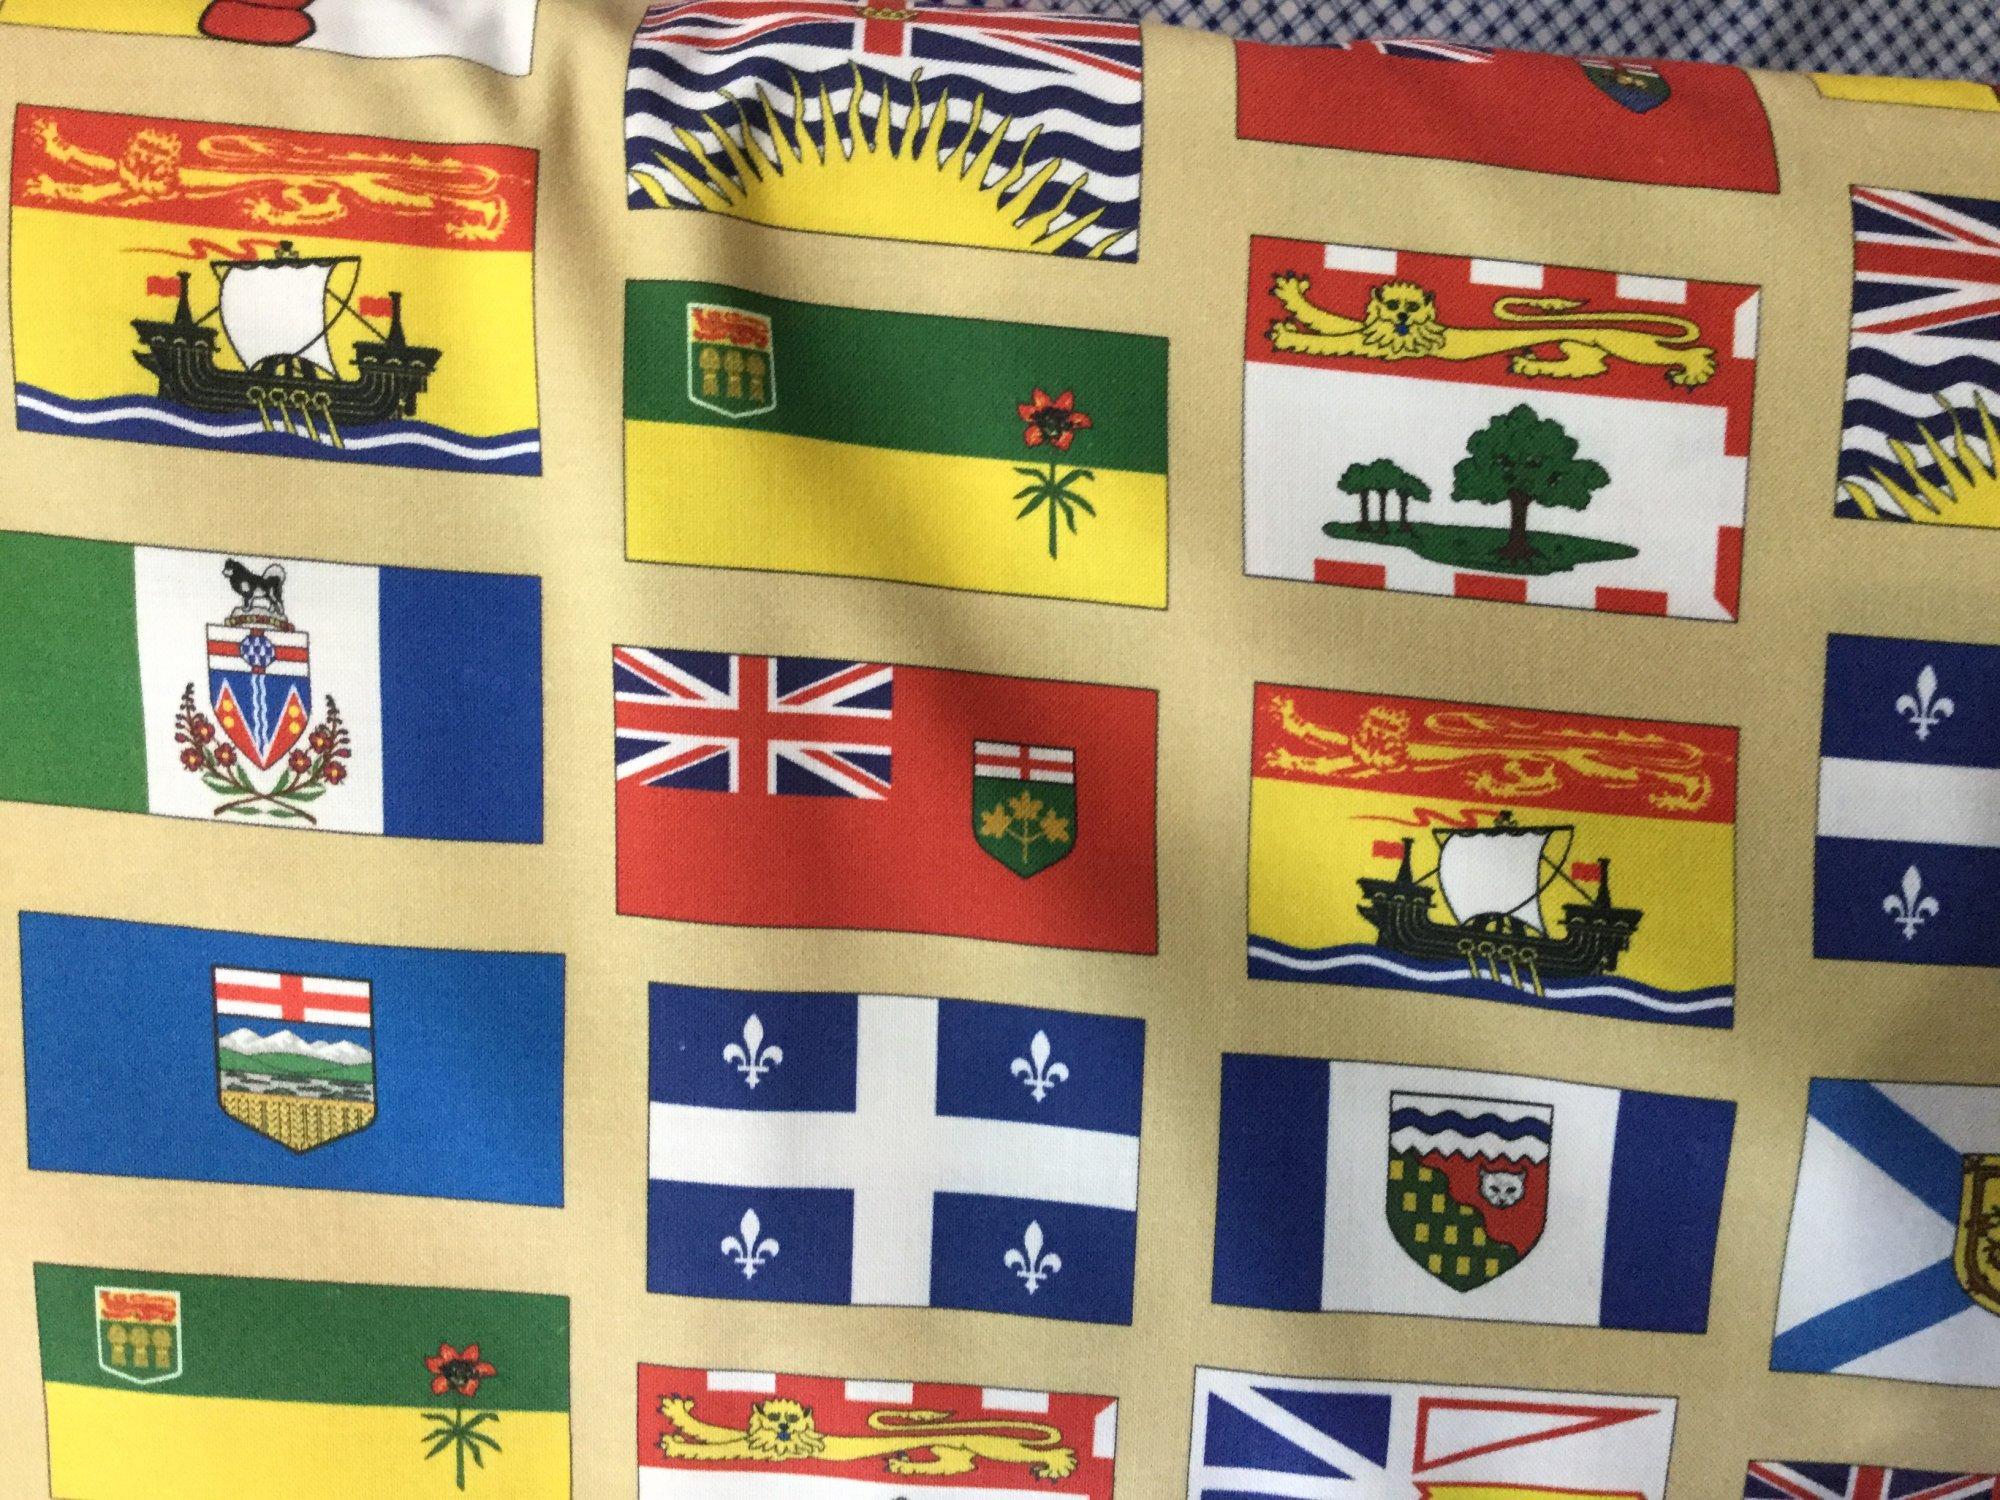 Canada 150 Provinces